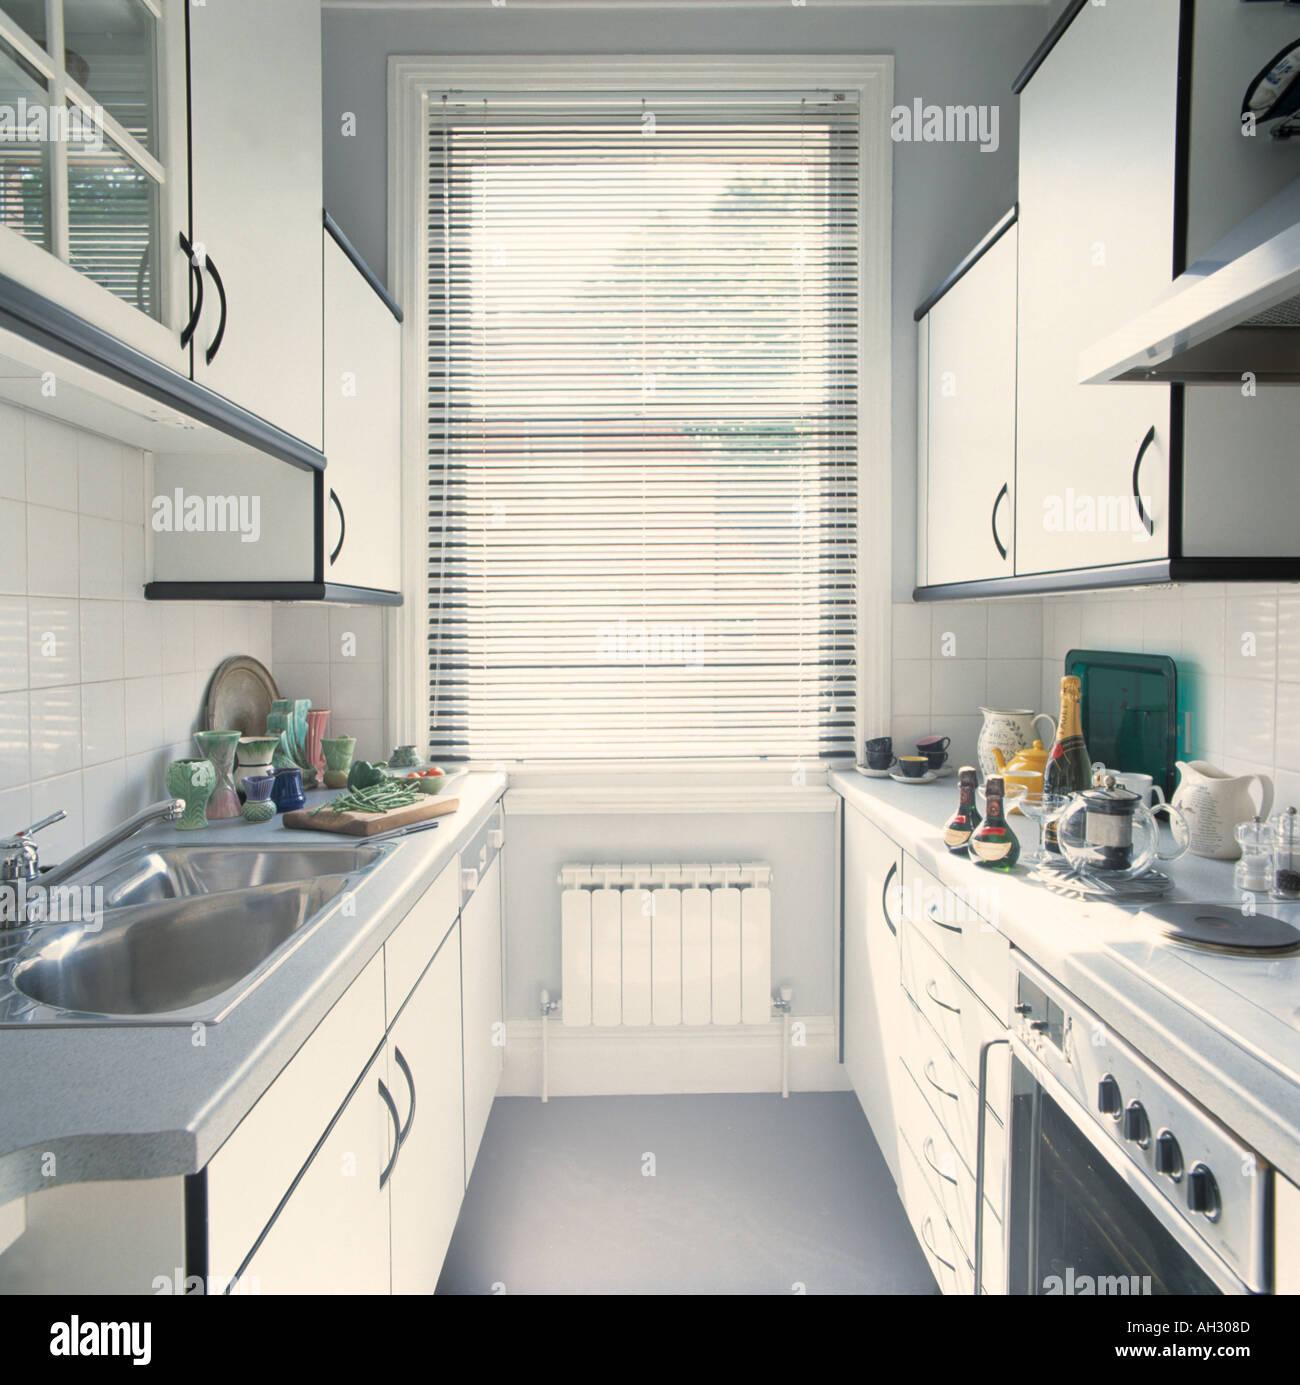 Monochromatic Kitchen Stock Photo Alamy